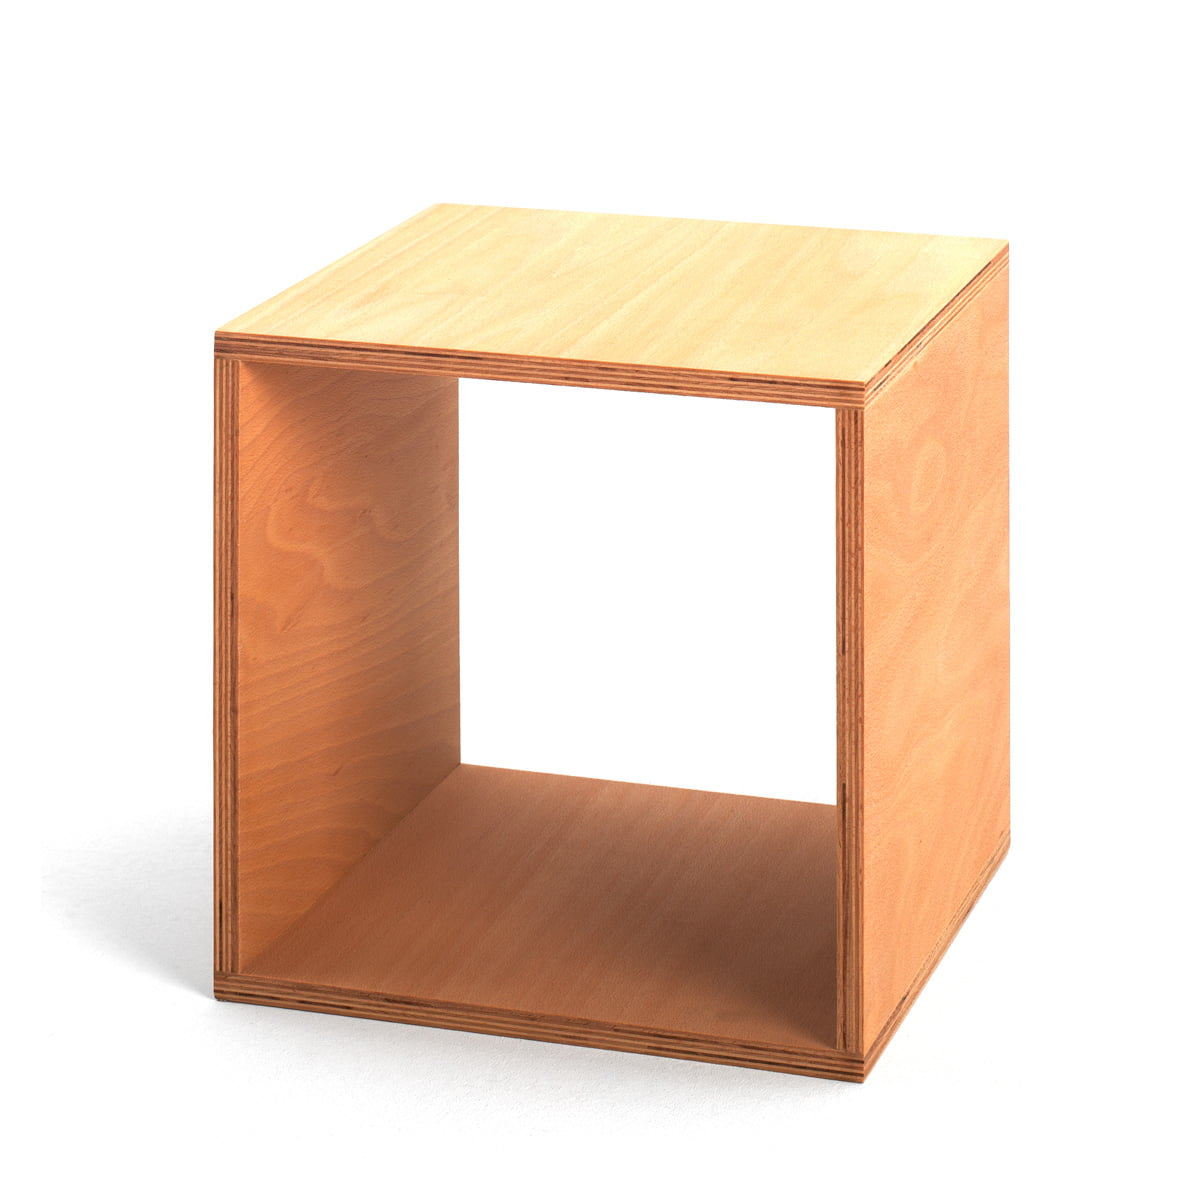 cube chevet tojo boutique. Black Bedroom Furniture Sets. Home Design Ideas